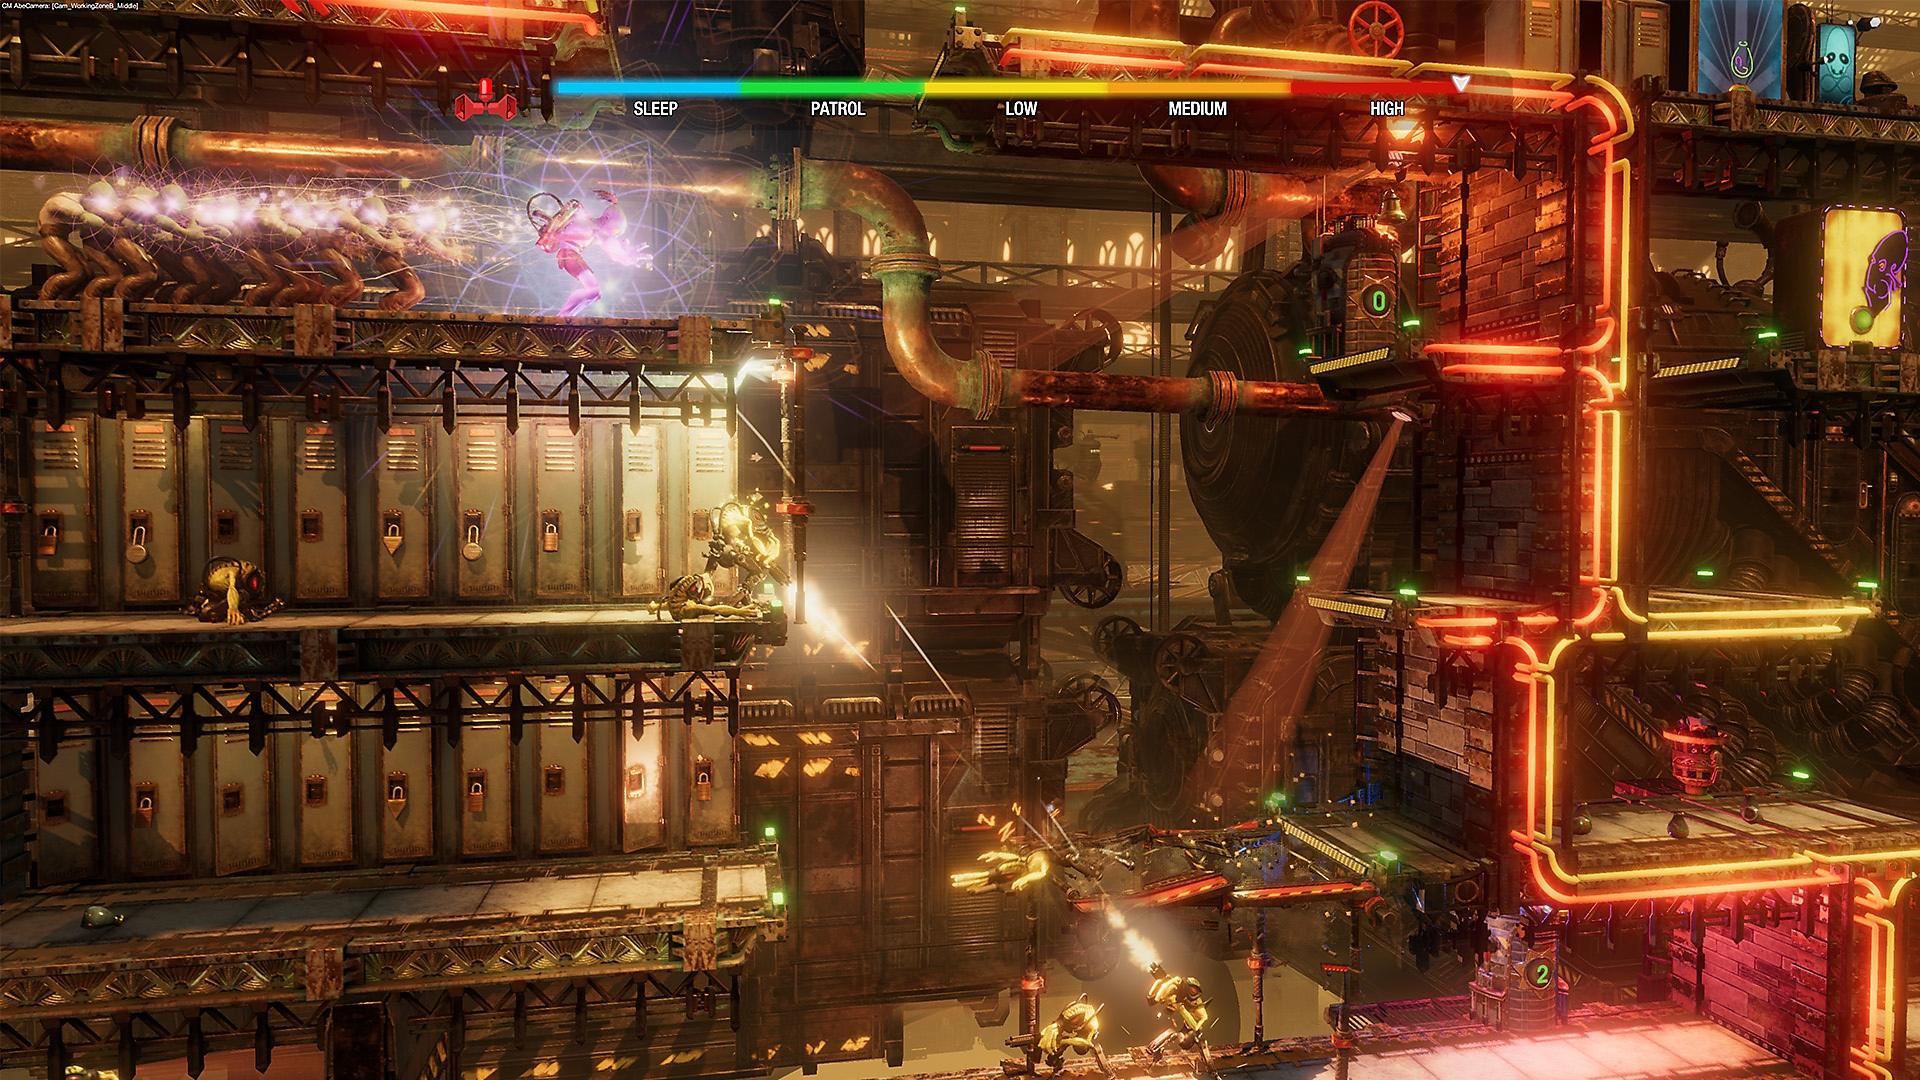 Oddworld Soulstorm reveal screenshot